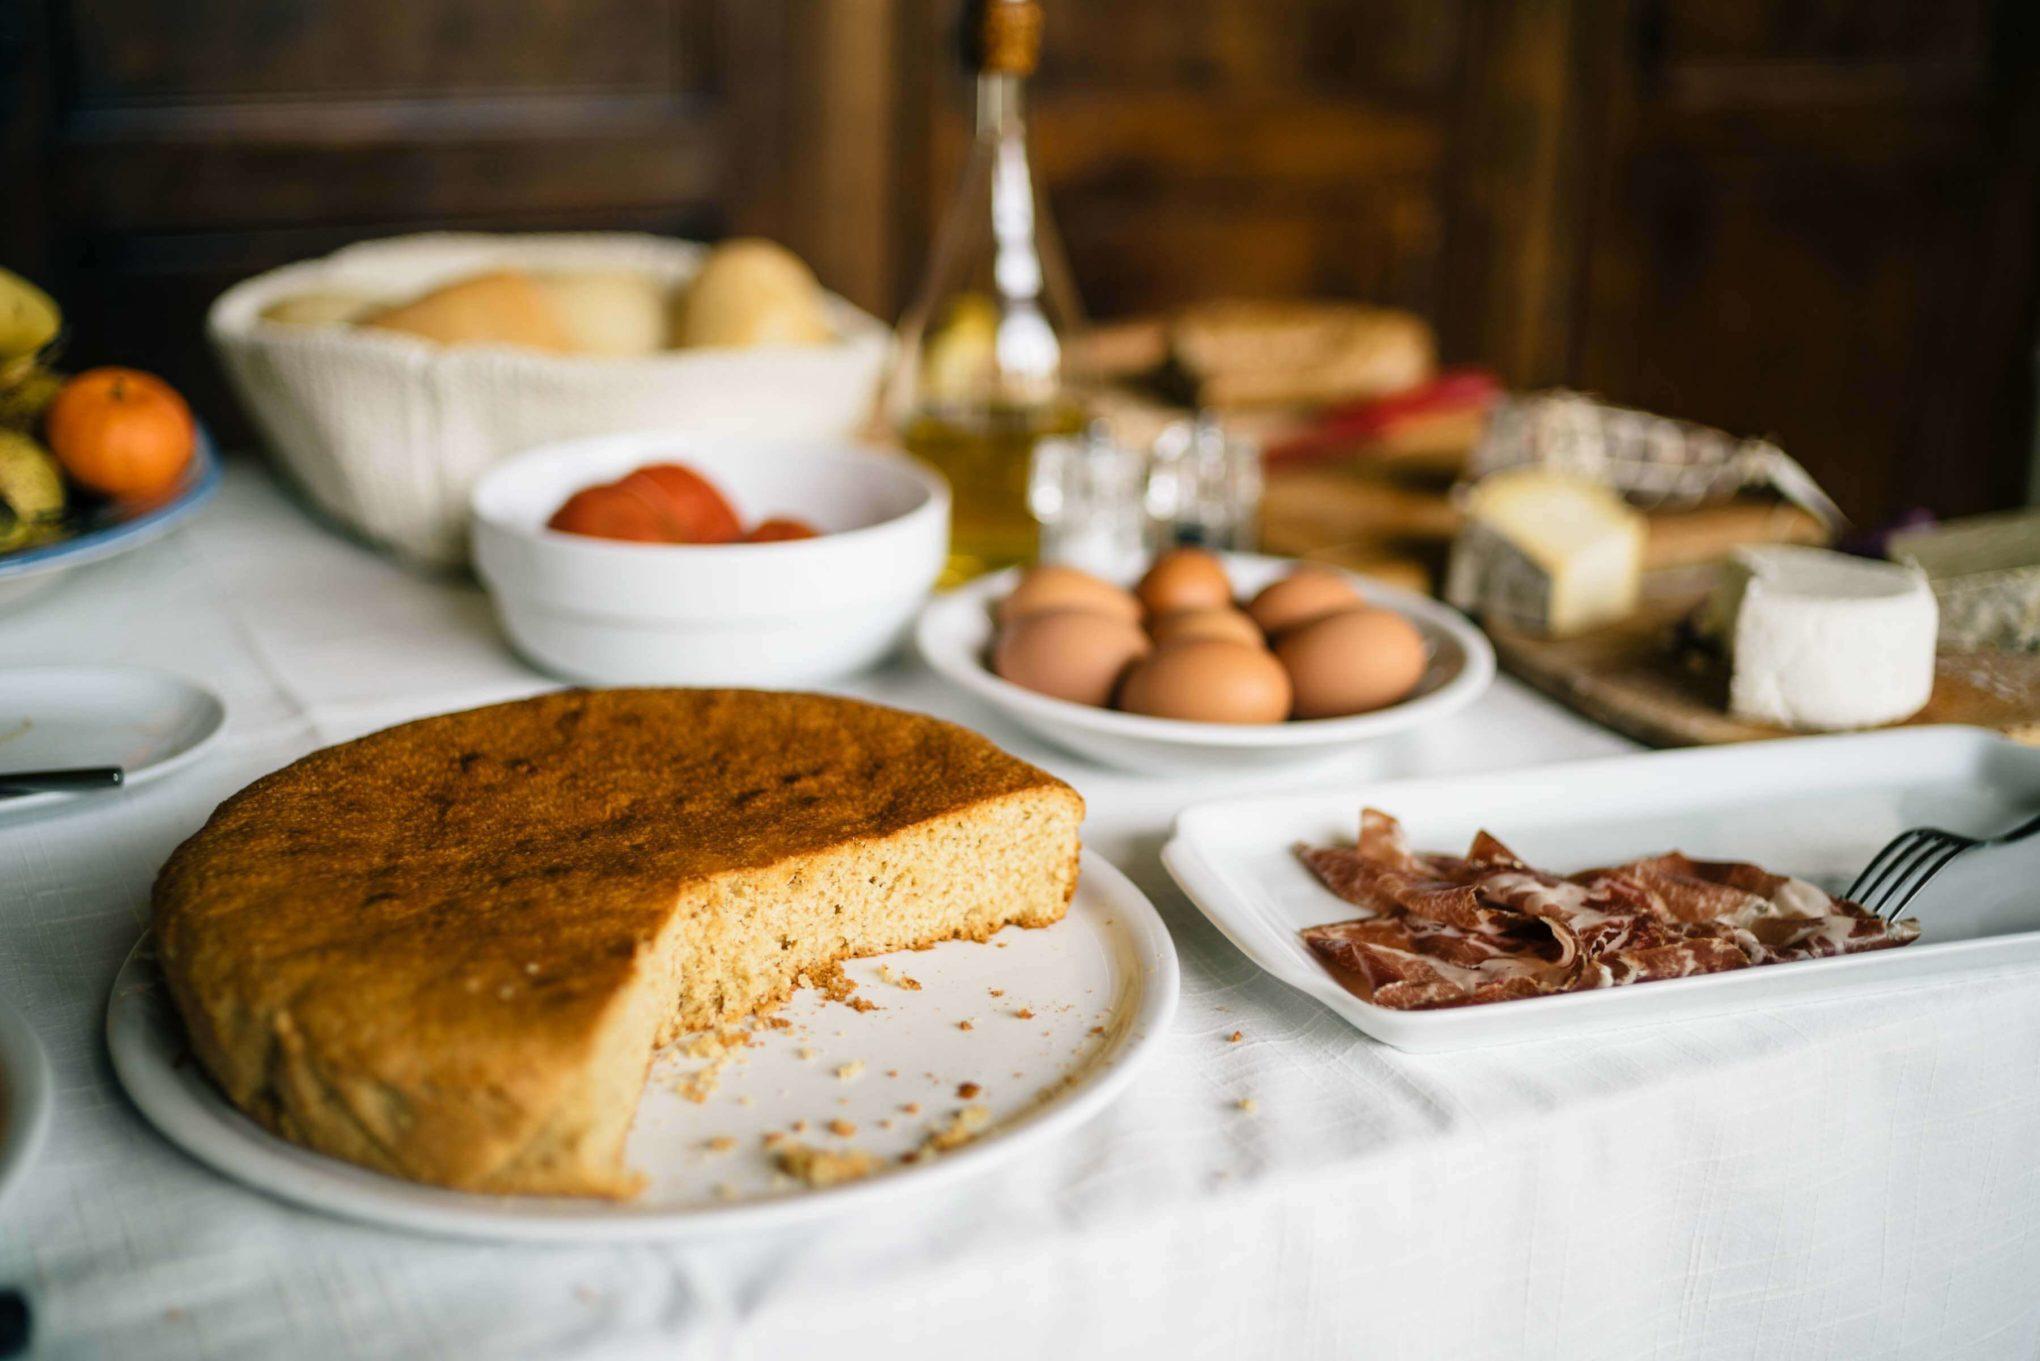 Make this Italian cake recipe - Torta di Nocciole - The Taste SF shares a Hazelnut Cake recipe from Piedmont.